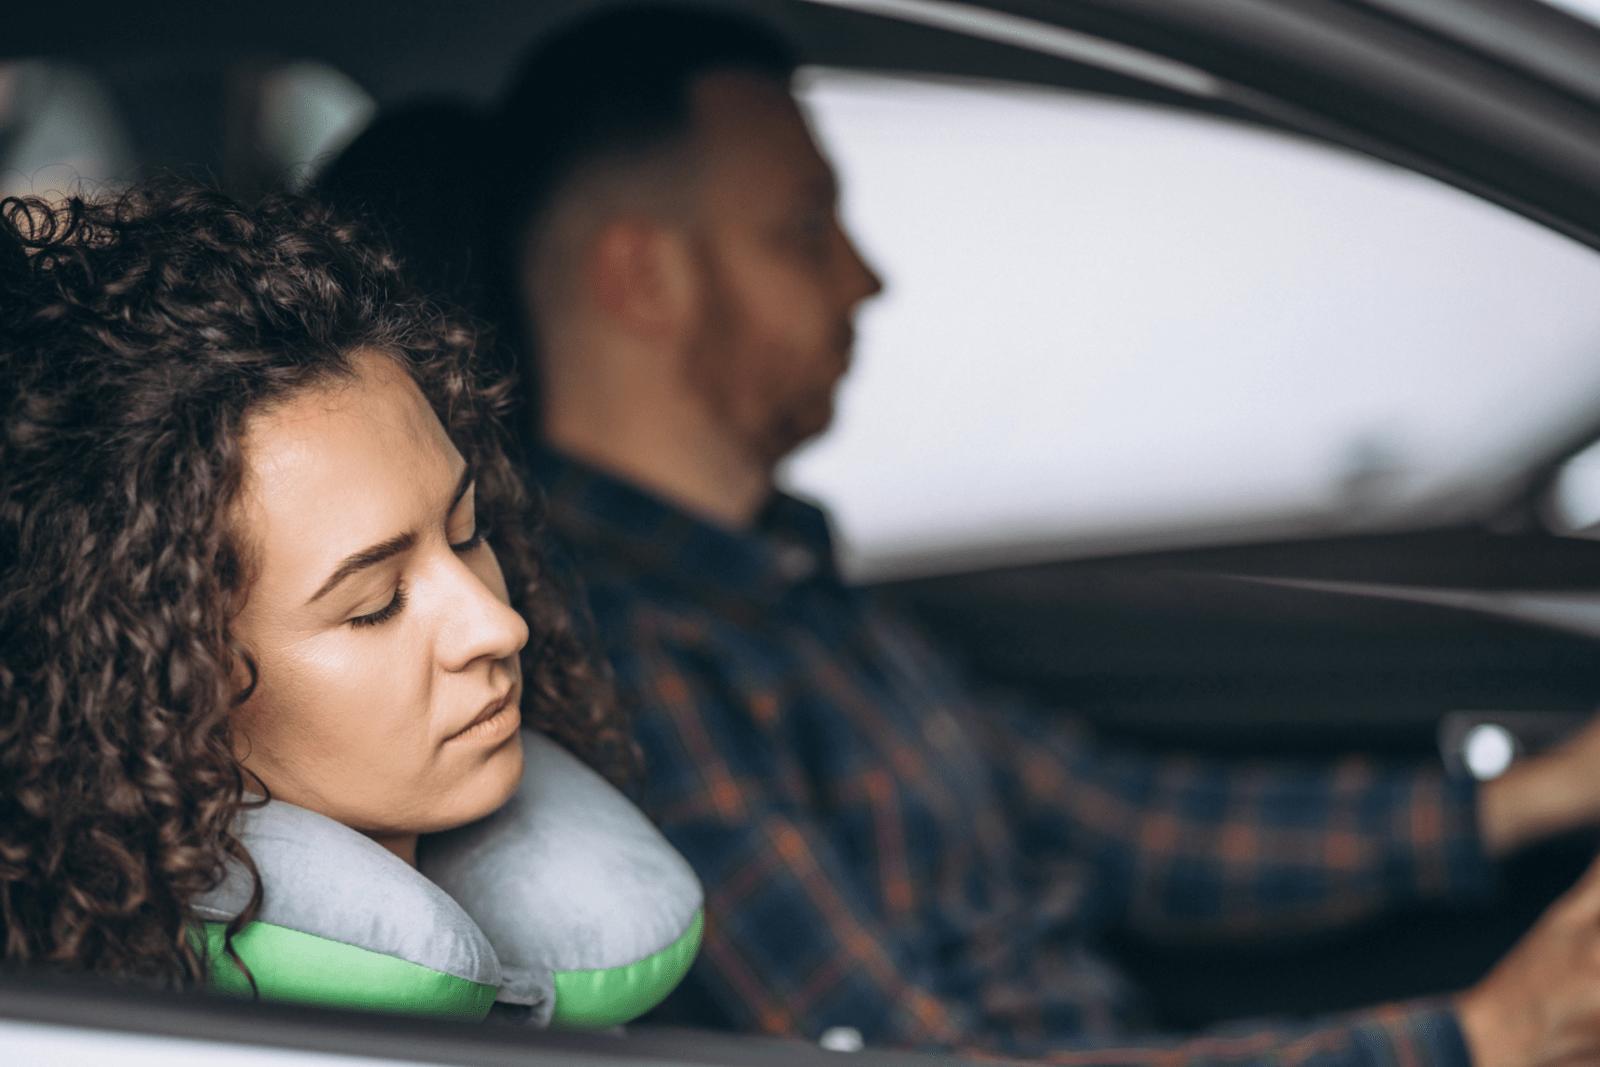 Inslapen in auto